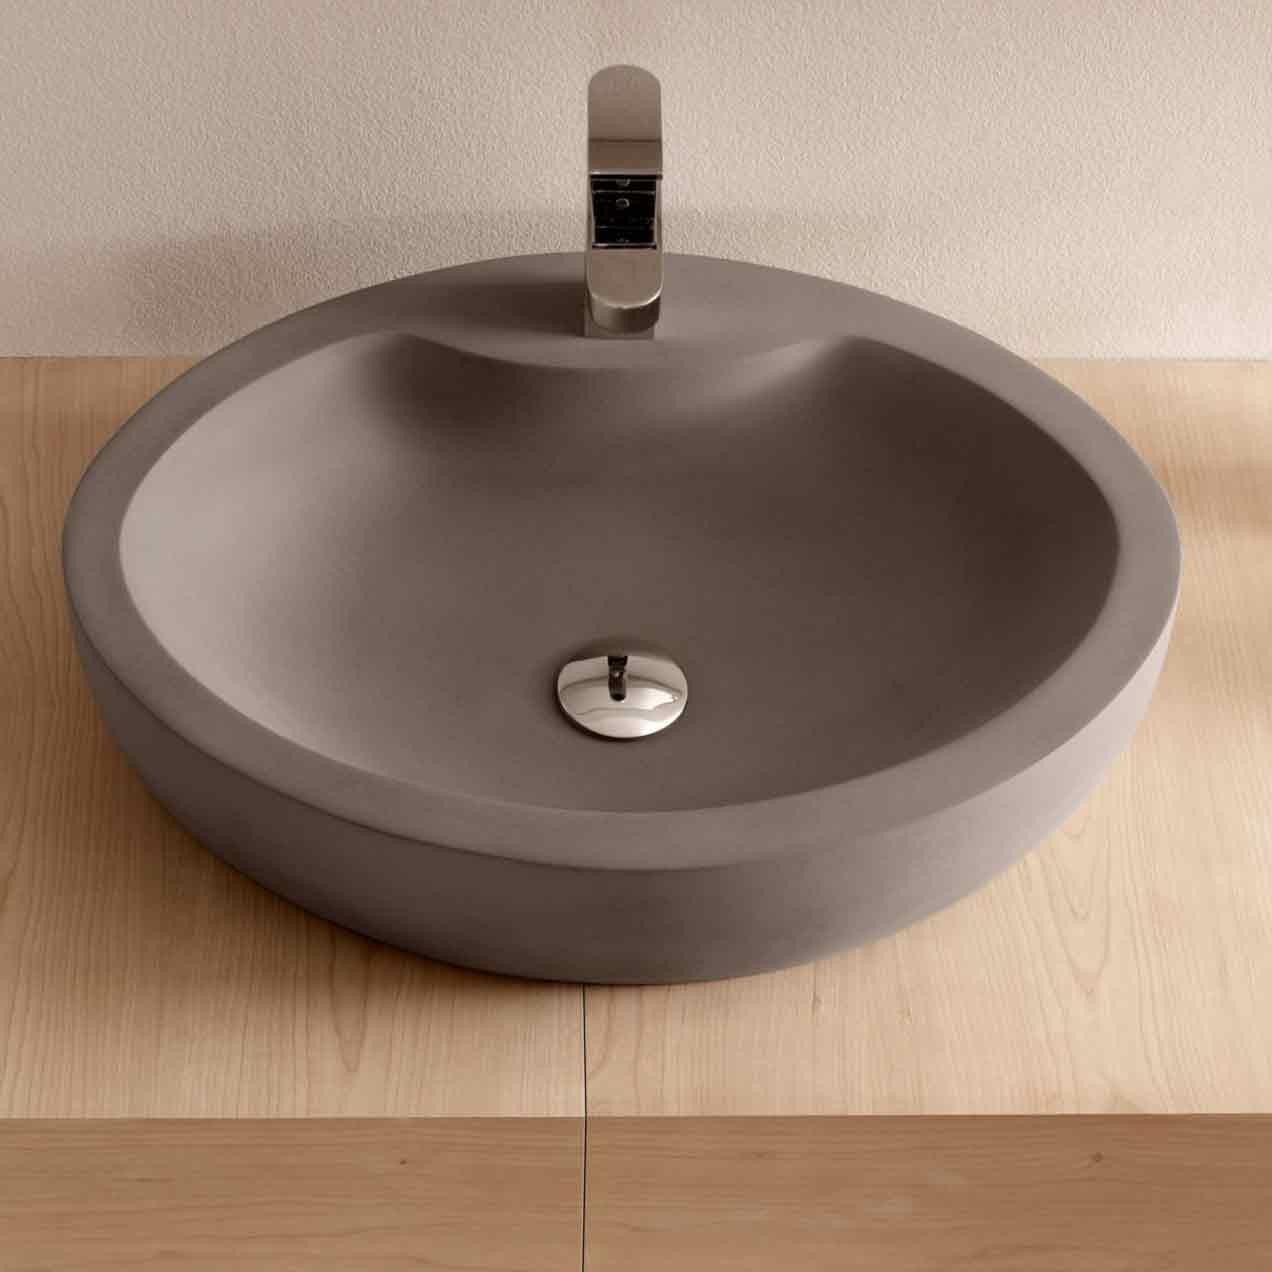 Lavabo Salle De Bain Ovale ~ lavabo top counter barros bathco 550 x 400 x 120 mm bathco 08014